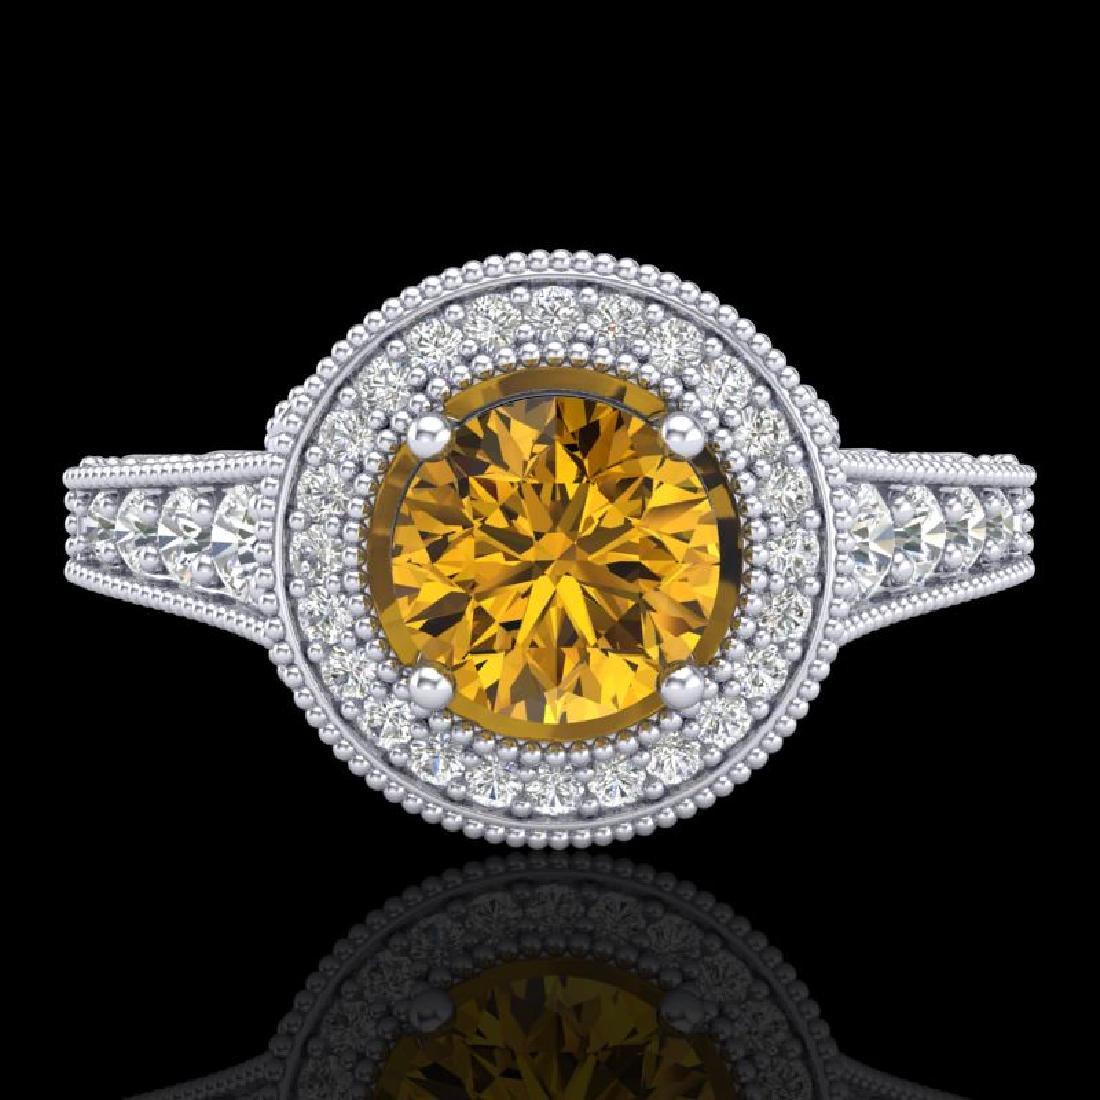 1.12 CTW Intense Fancy Yellow Diamond Engagement Art - 2